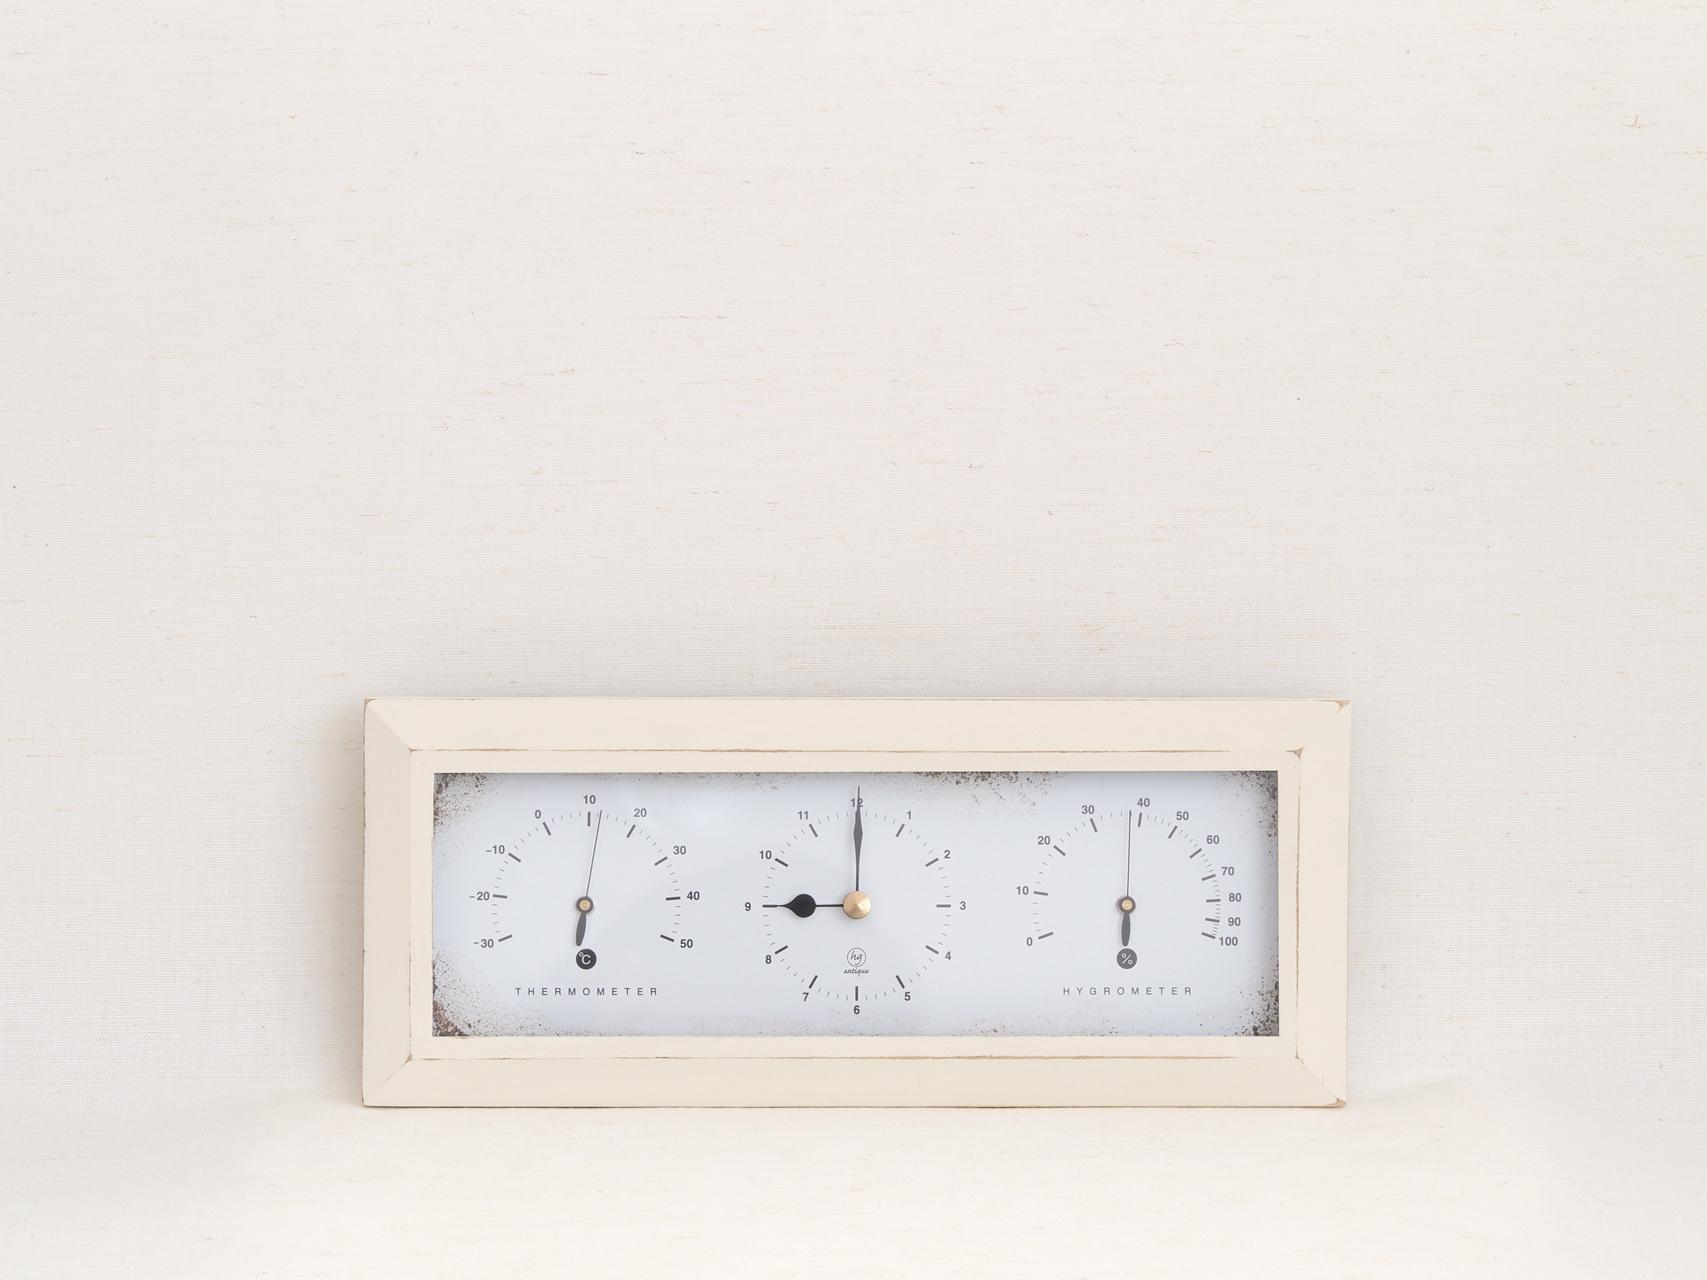 HAKARU ハカル / 温湿度計 時計 Antique Clock アンティーククロック 横型 壁掛け 置き時計 アイボリー YTL-902